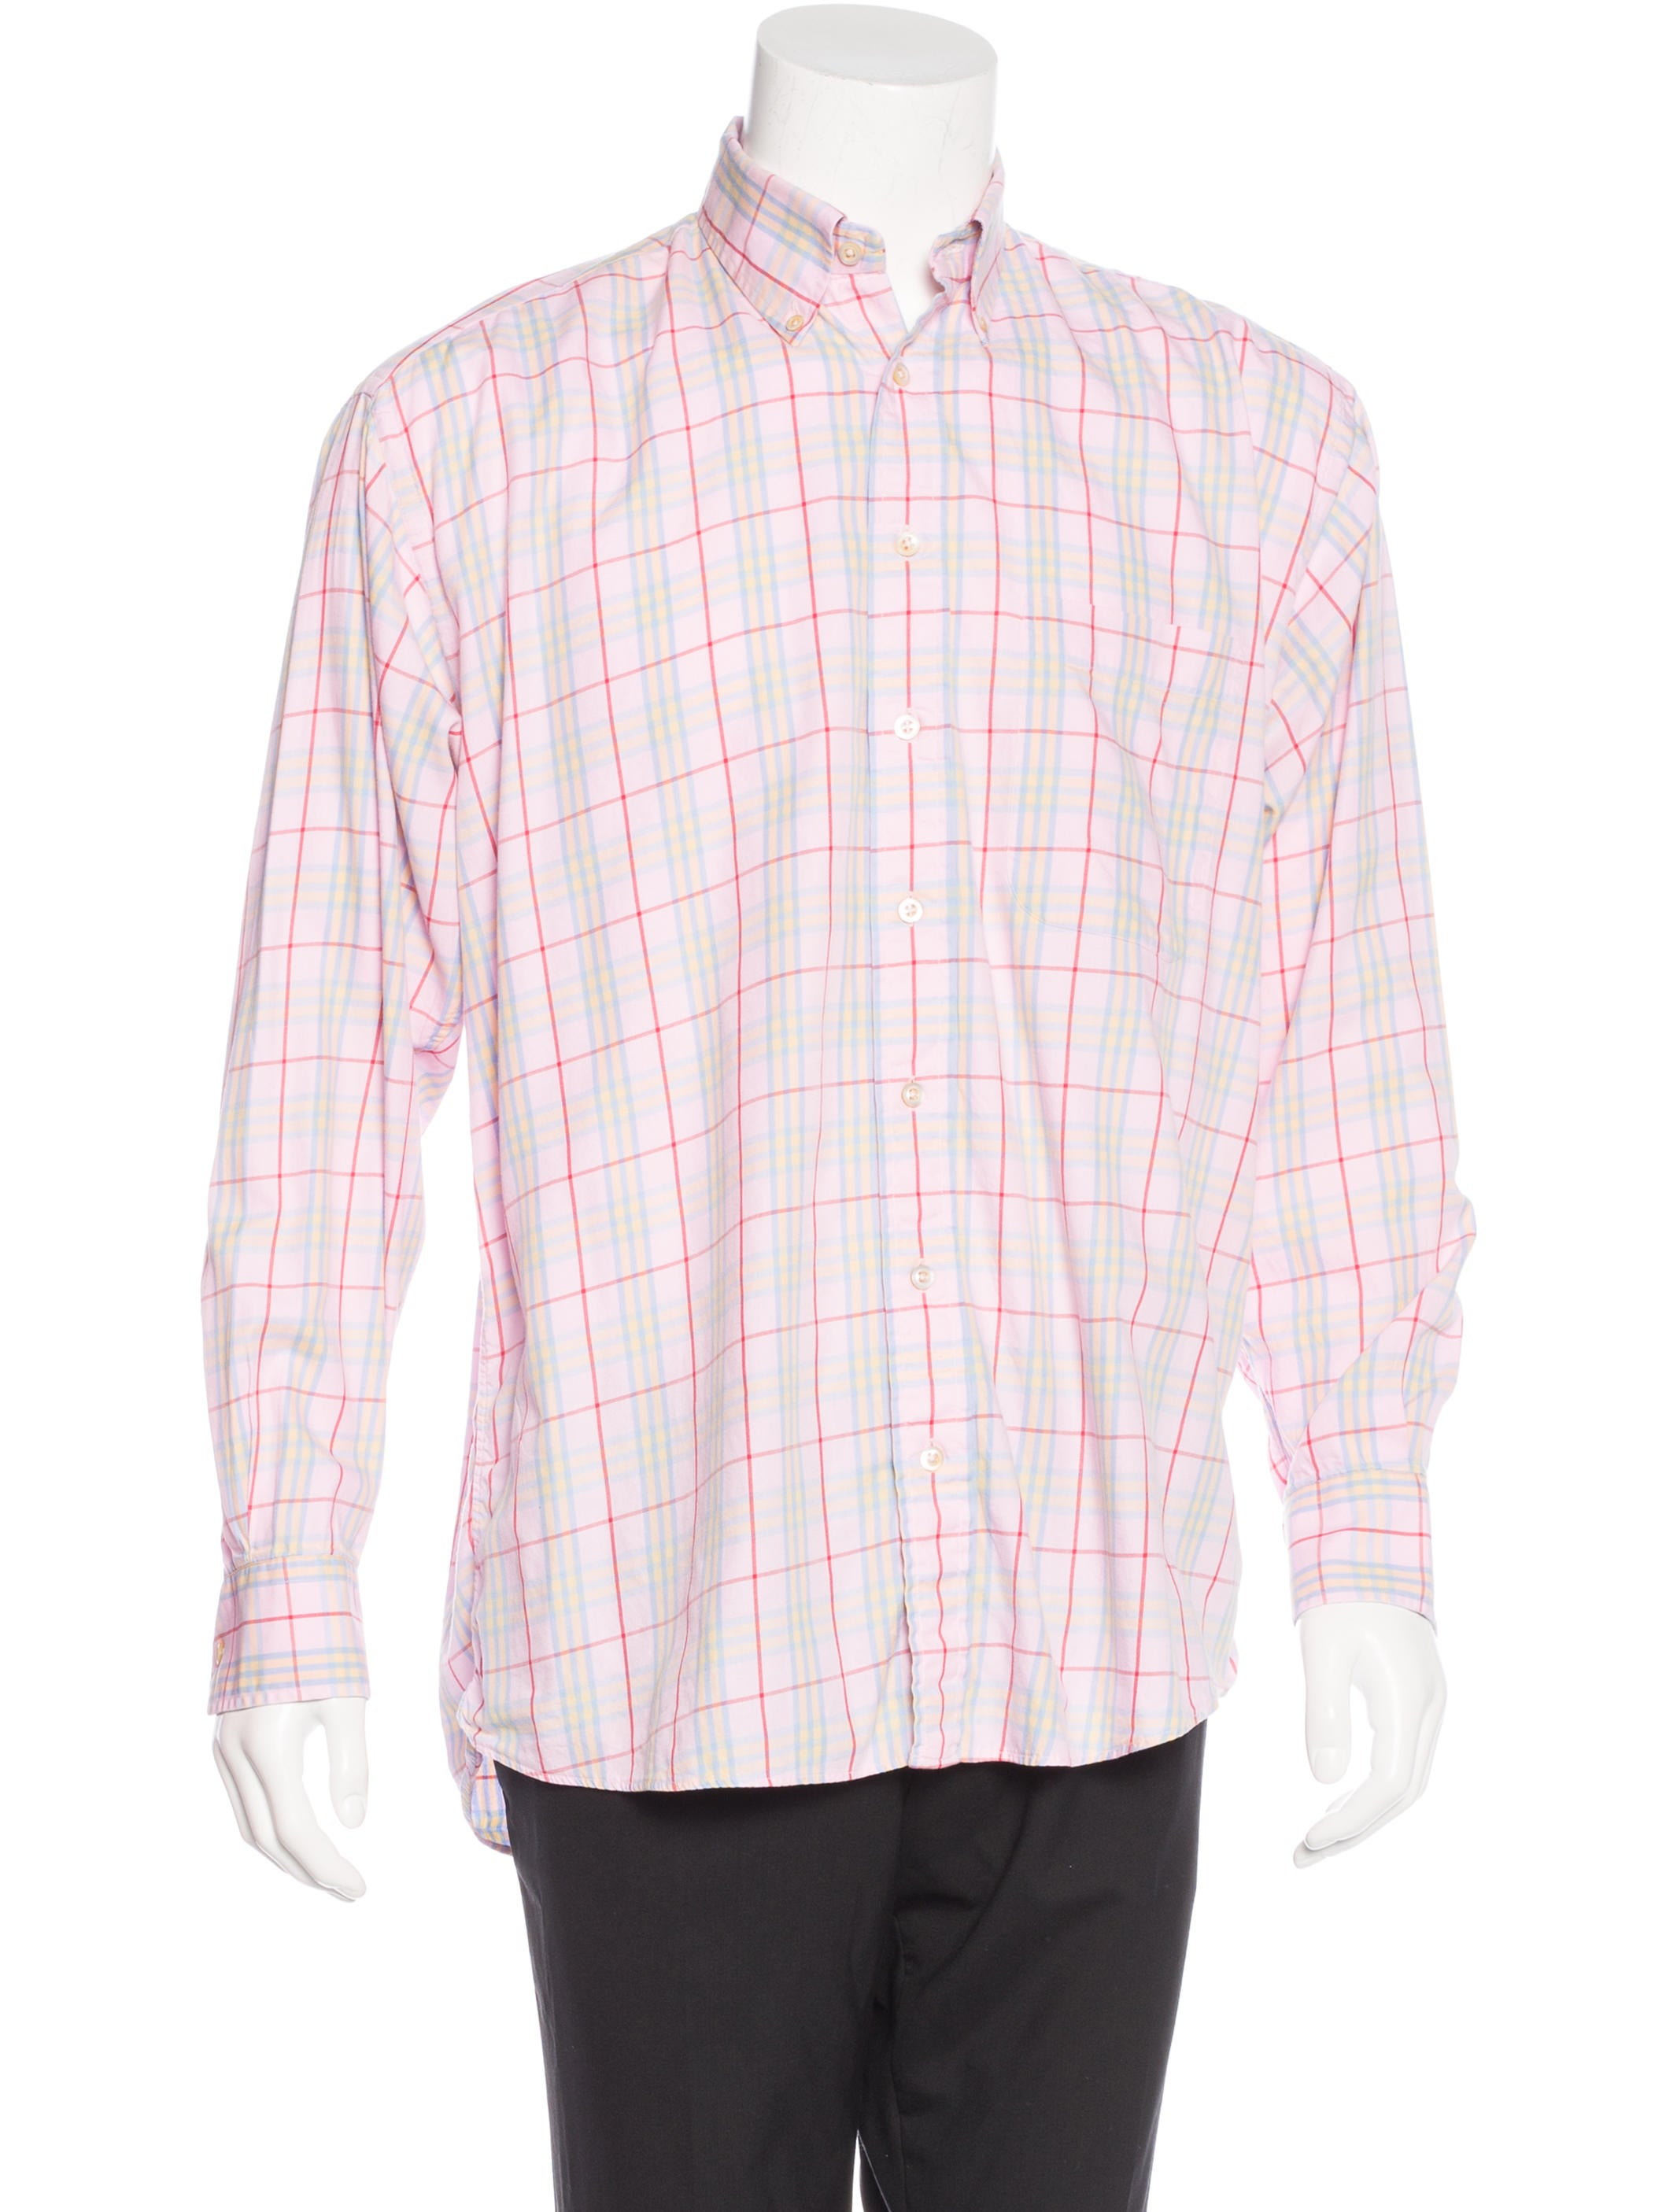 Burberry London Plaid Woven Shirt Clothing Wburl23869